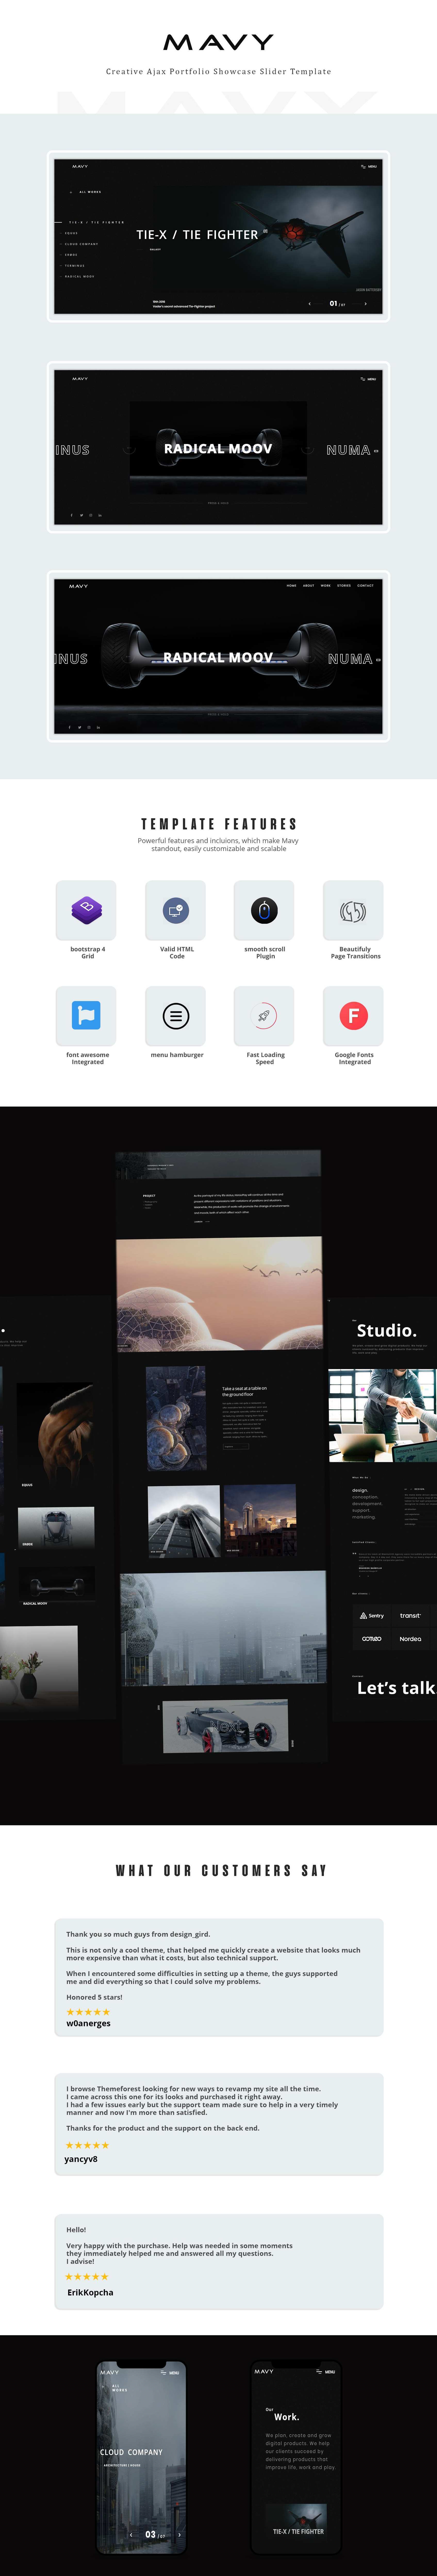 Mavy - Ajax Portfolio Showcase HTML Template - 3